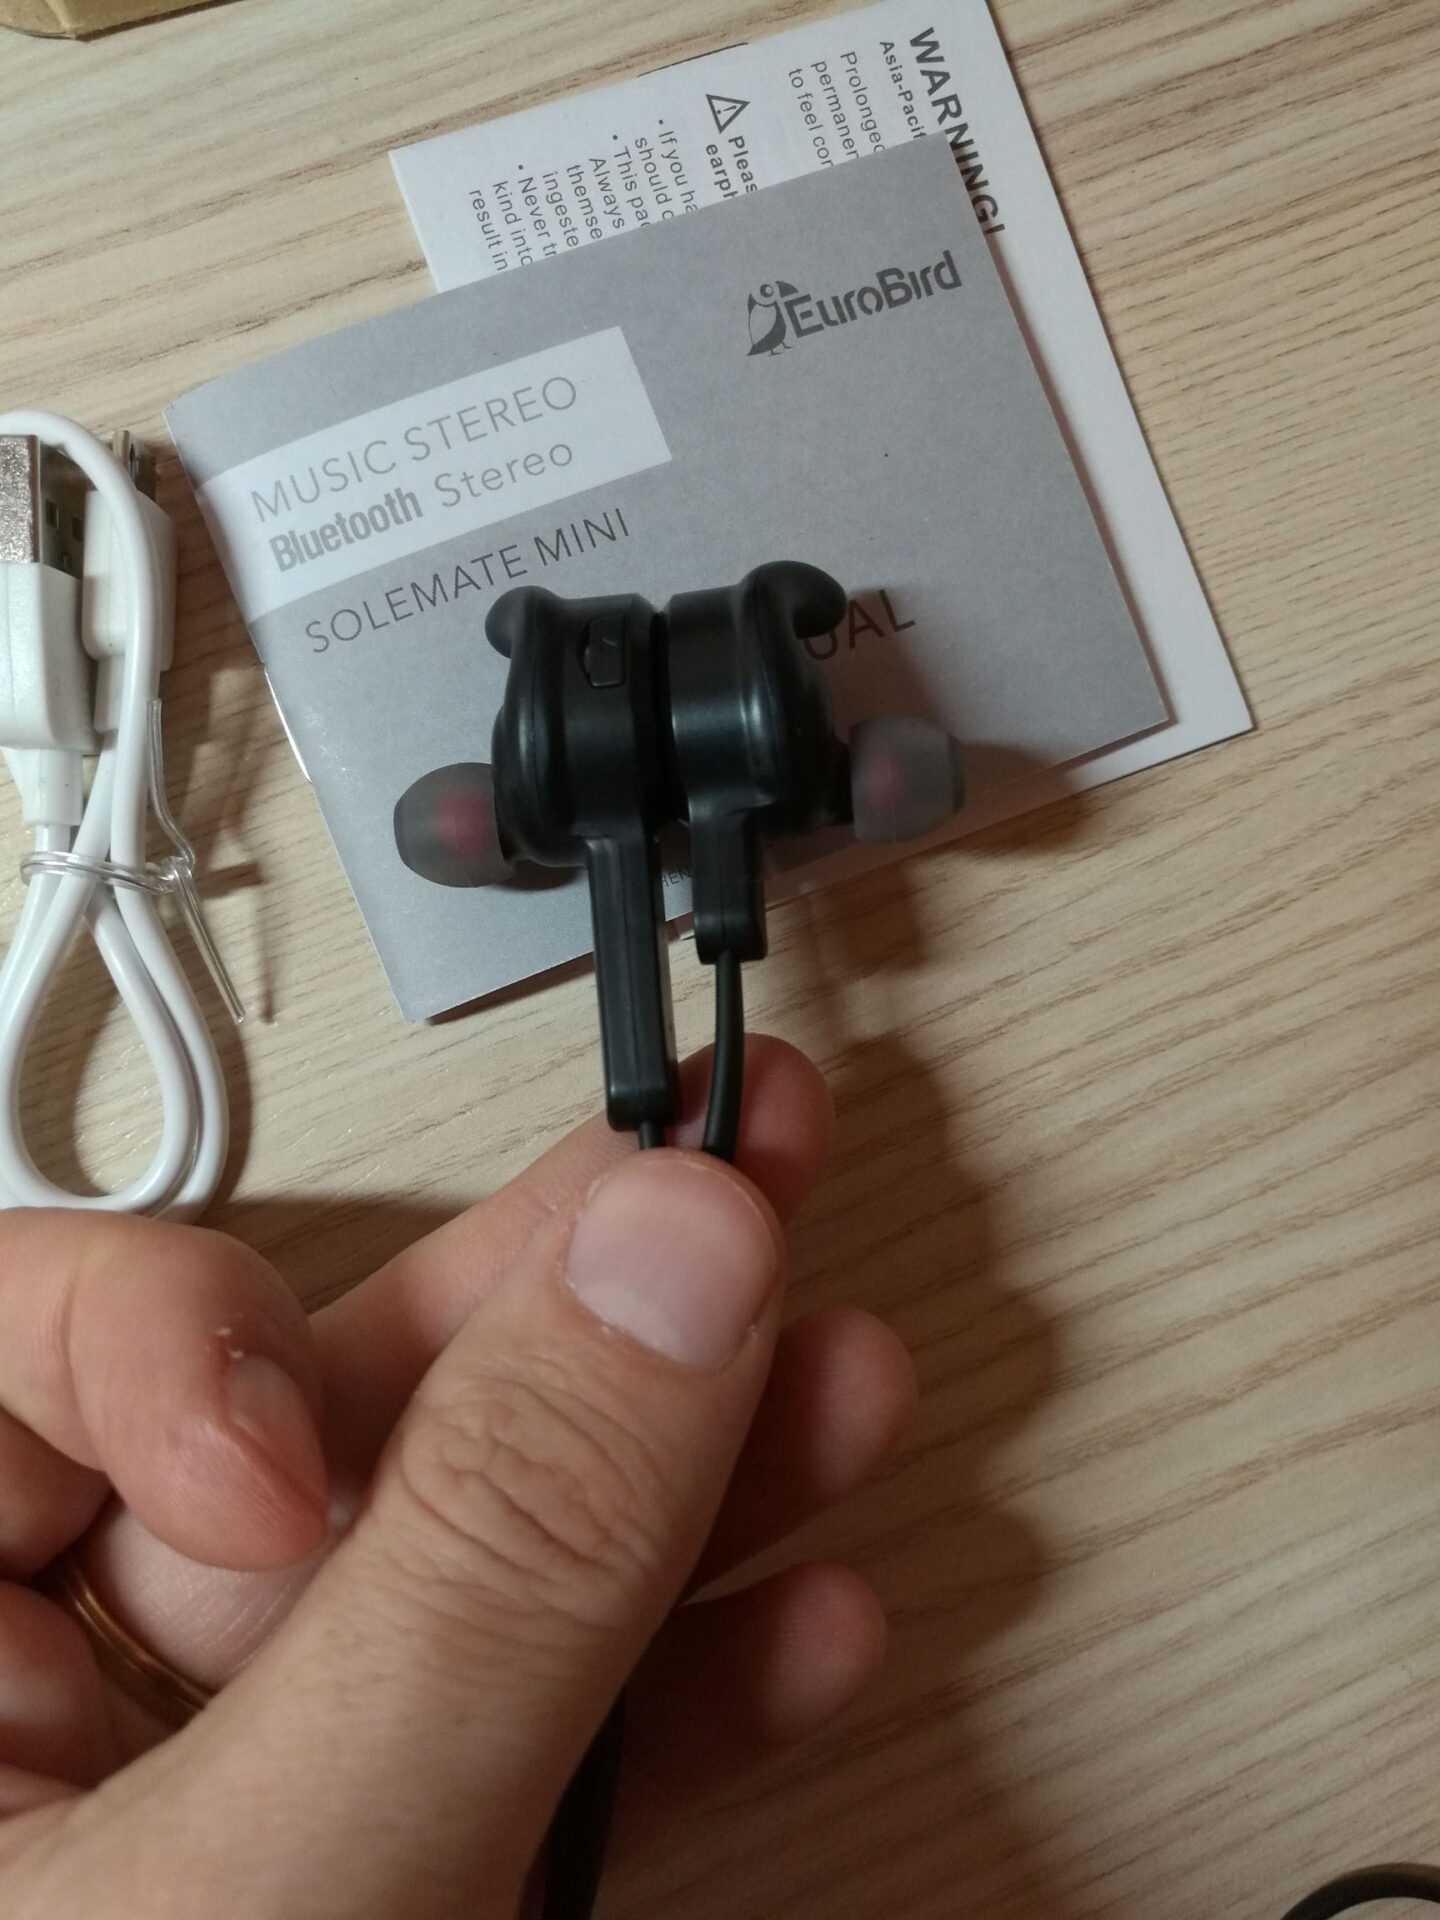 La mia recensione di Cuffie Bluetooth, Coolife